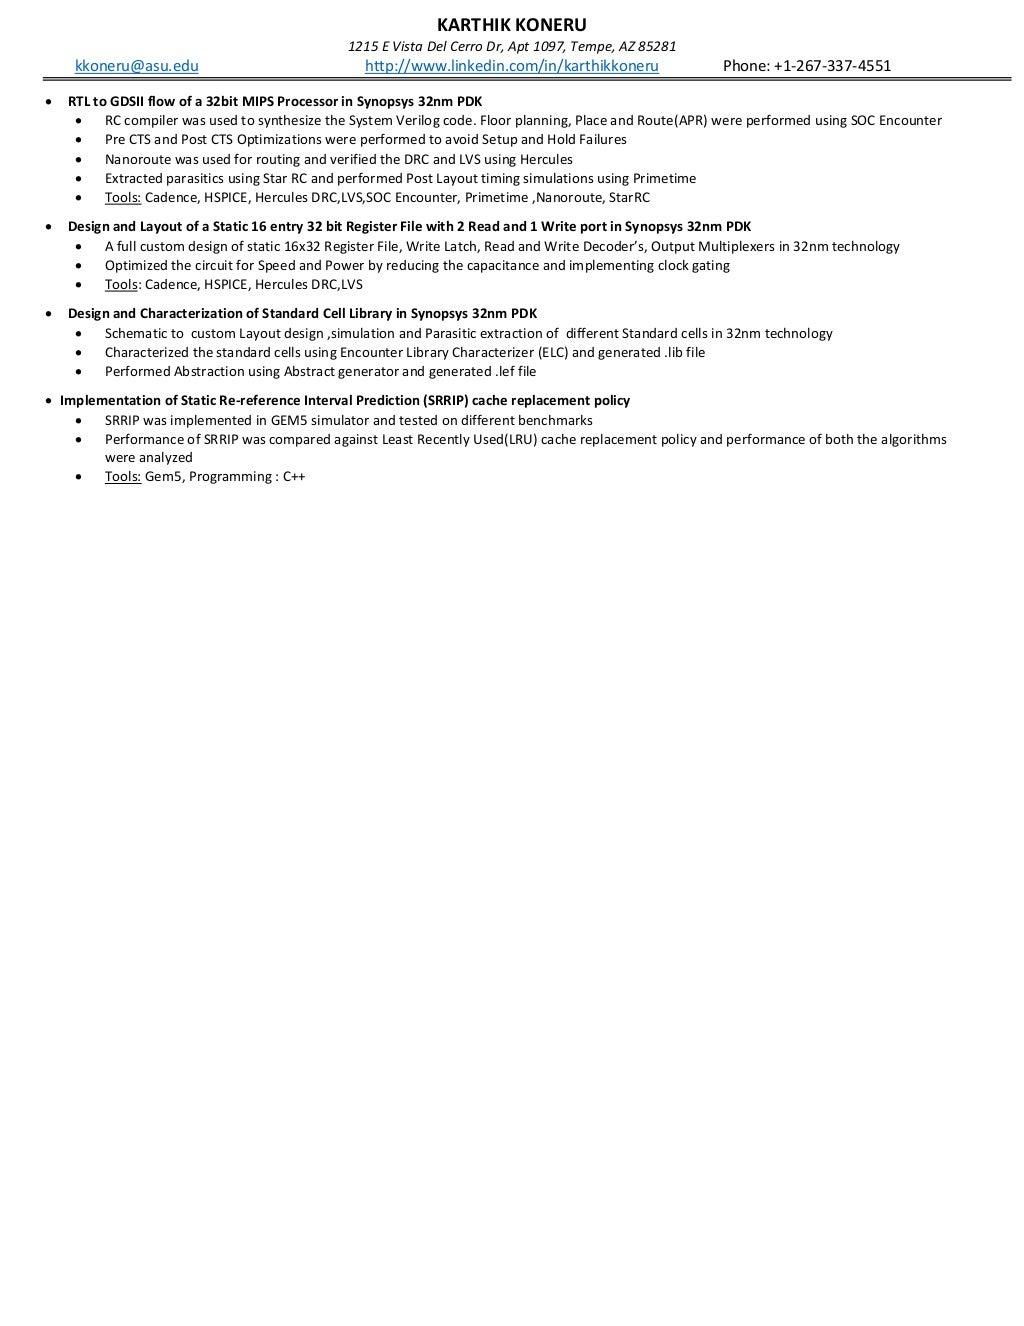 Example scientific research paper apa format